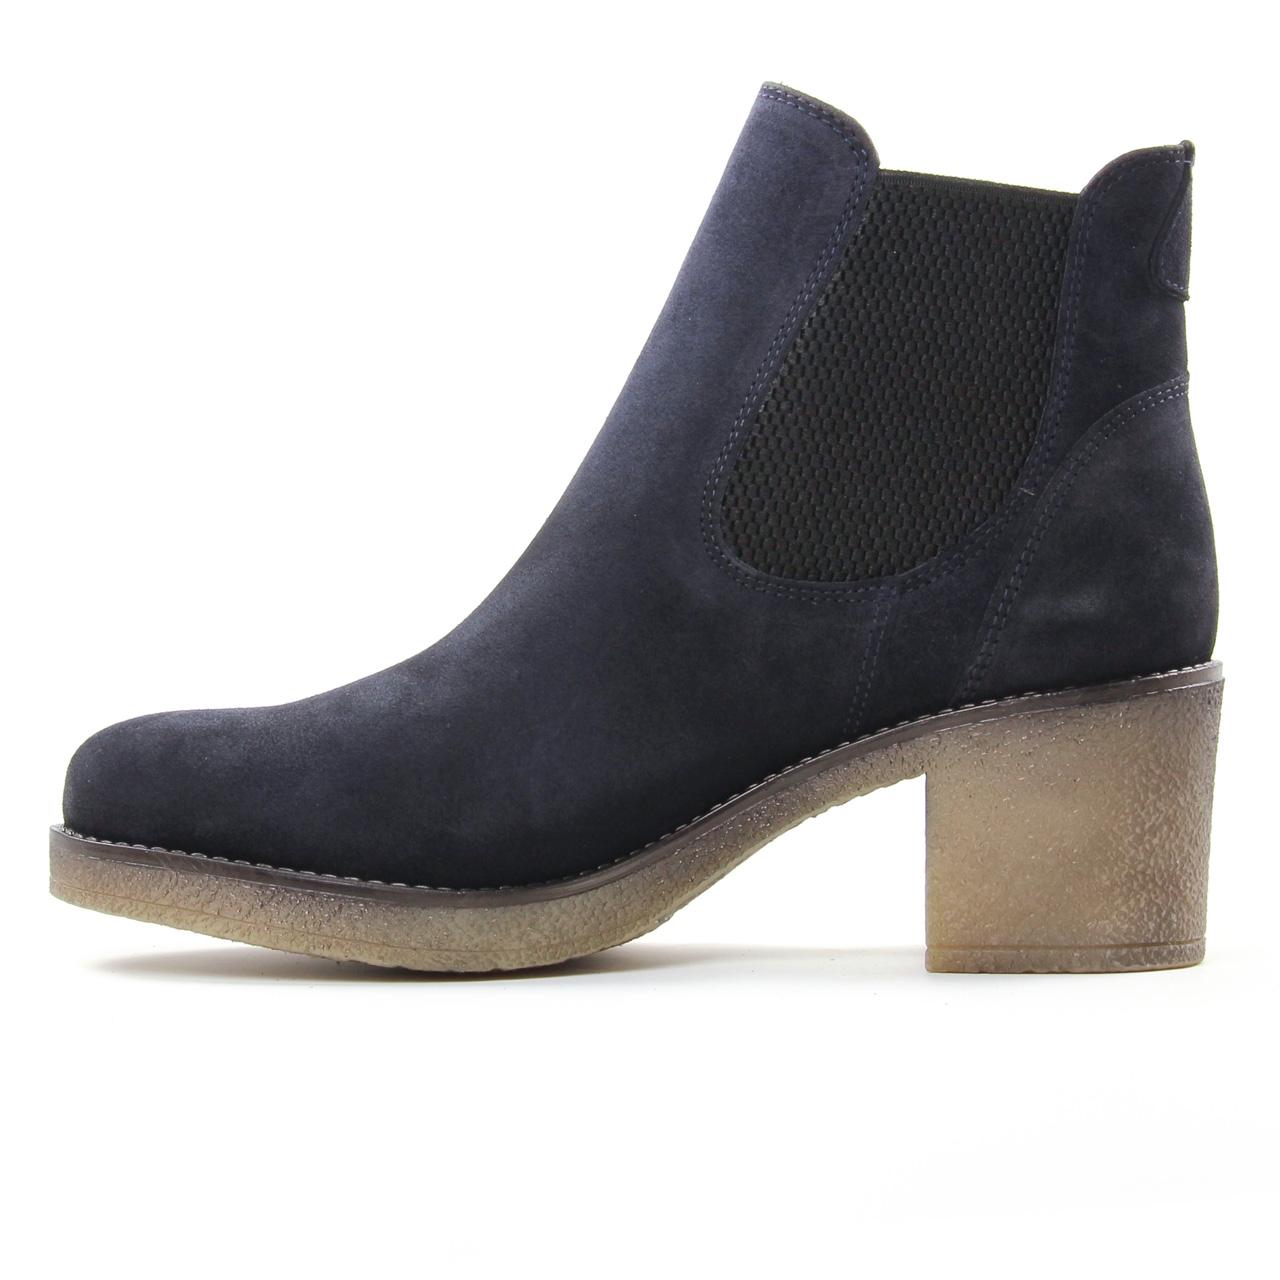 Pintodiblu Pour Bleu Femme 73132 Boots uFKJl13Tc